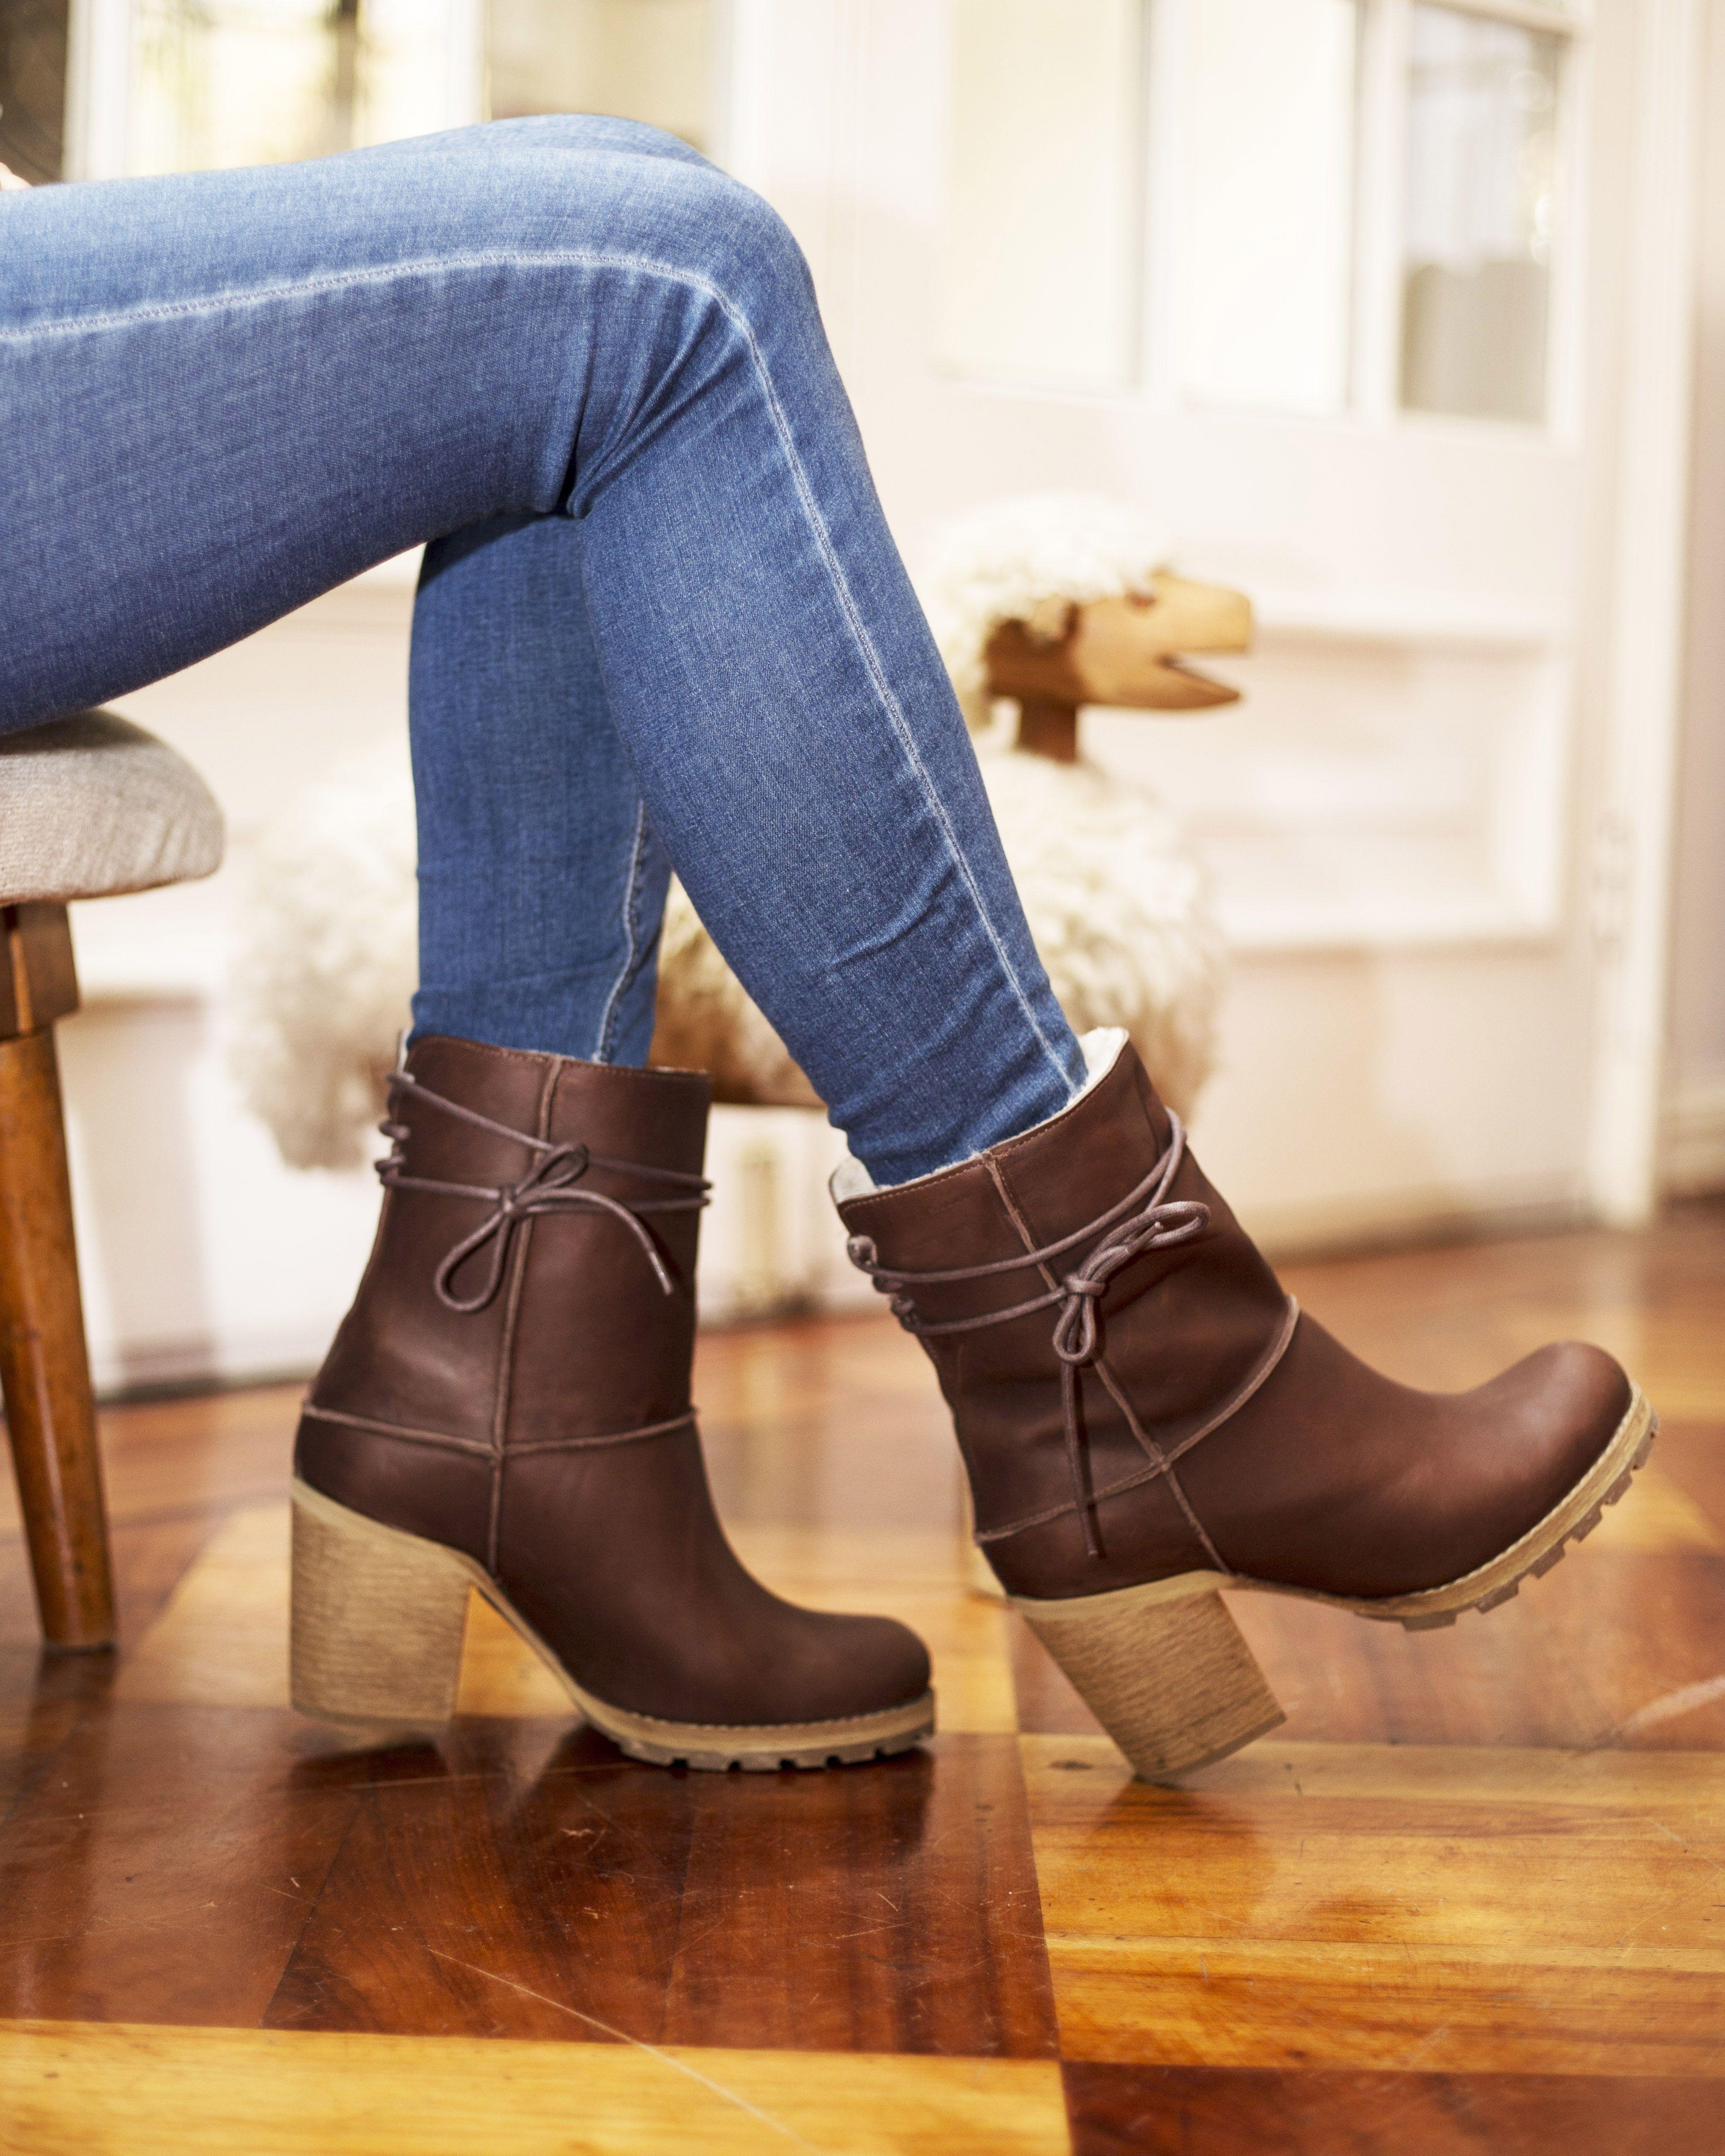 b83bbc1f45e98 150790 Café - Botines - Romano - Tienda Online Zapatos de Mujer ...